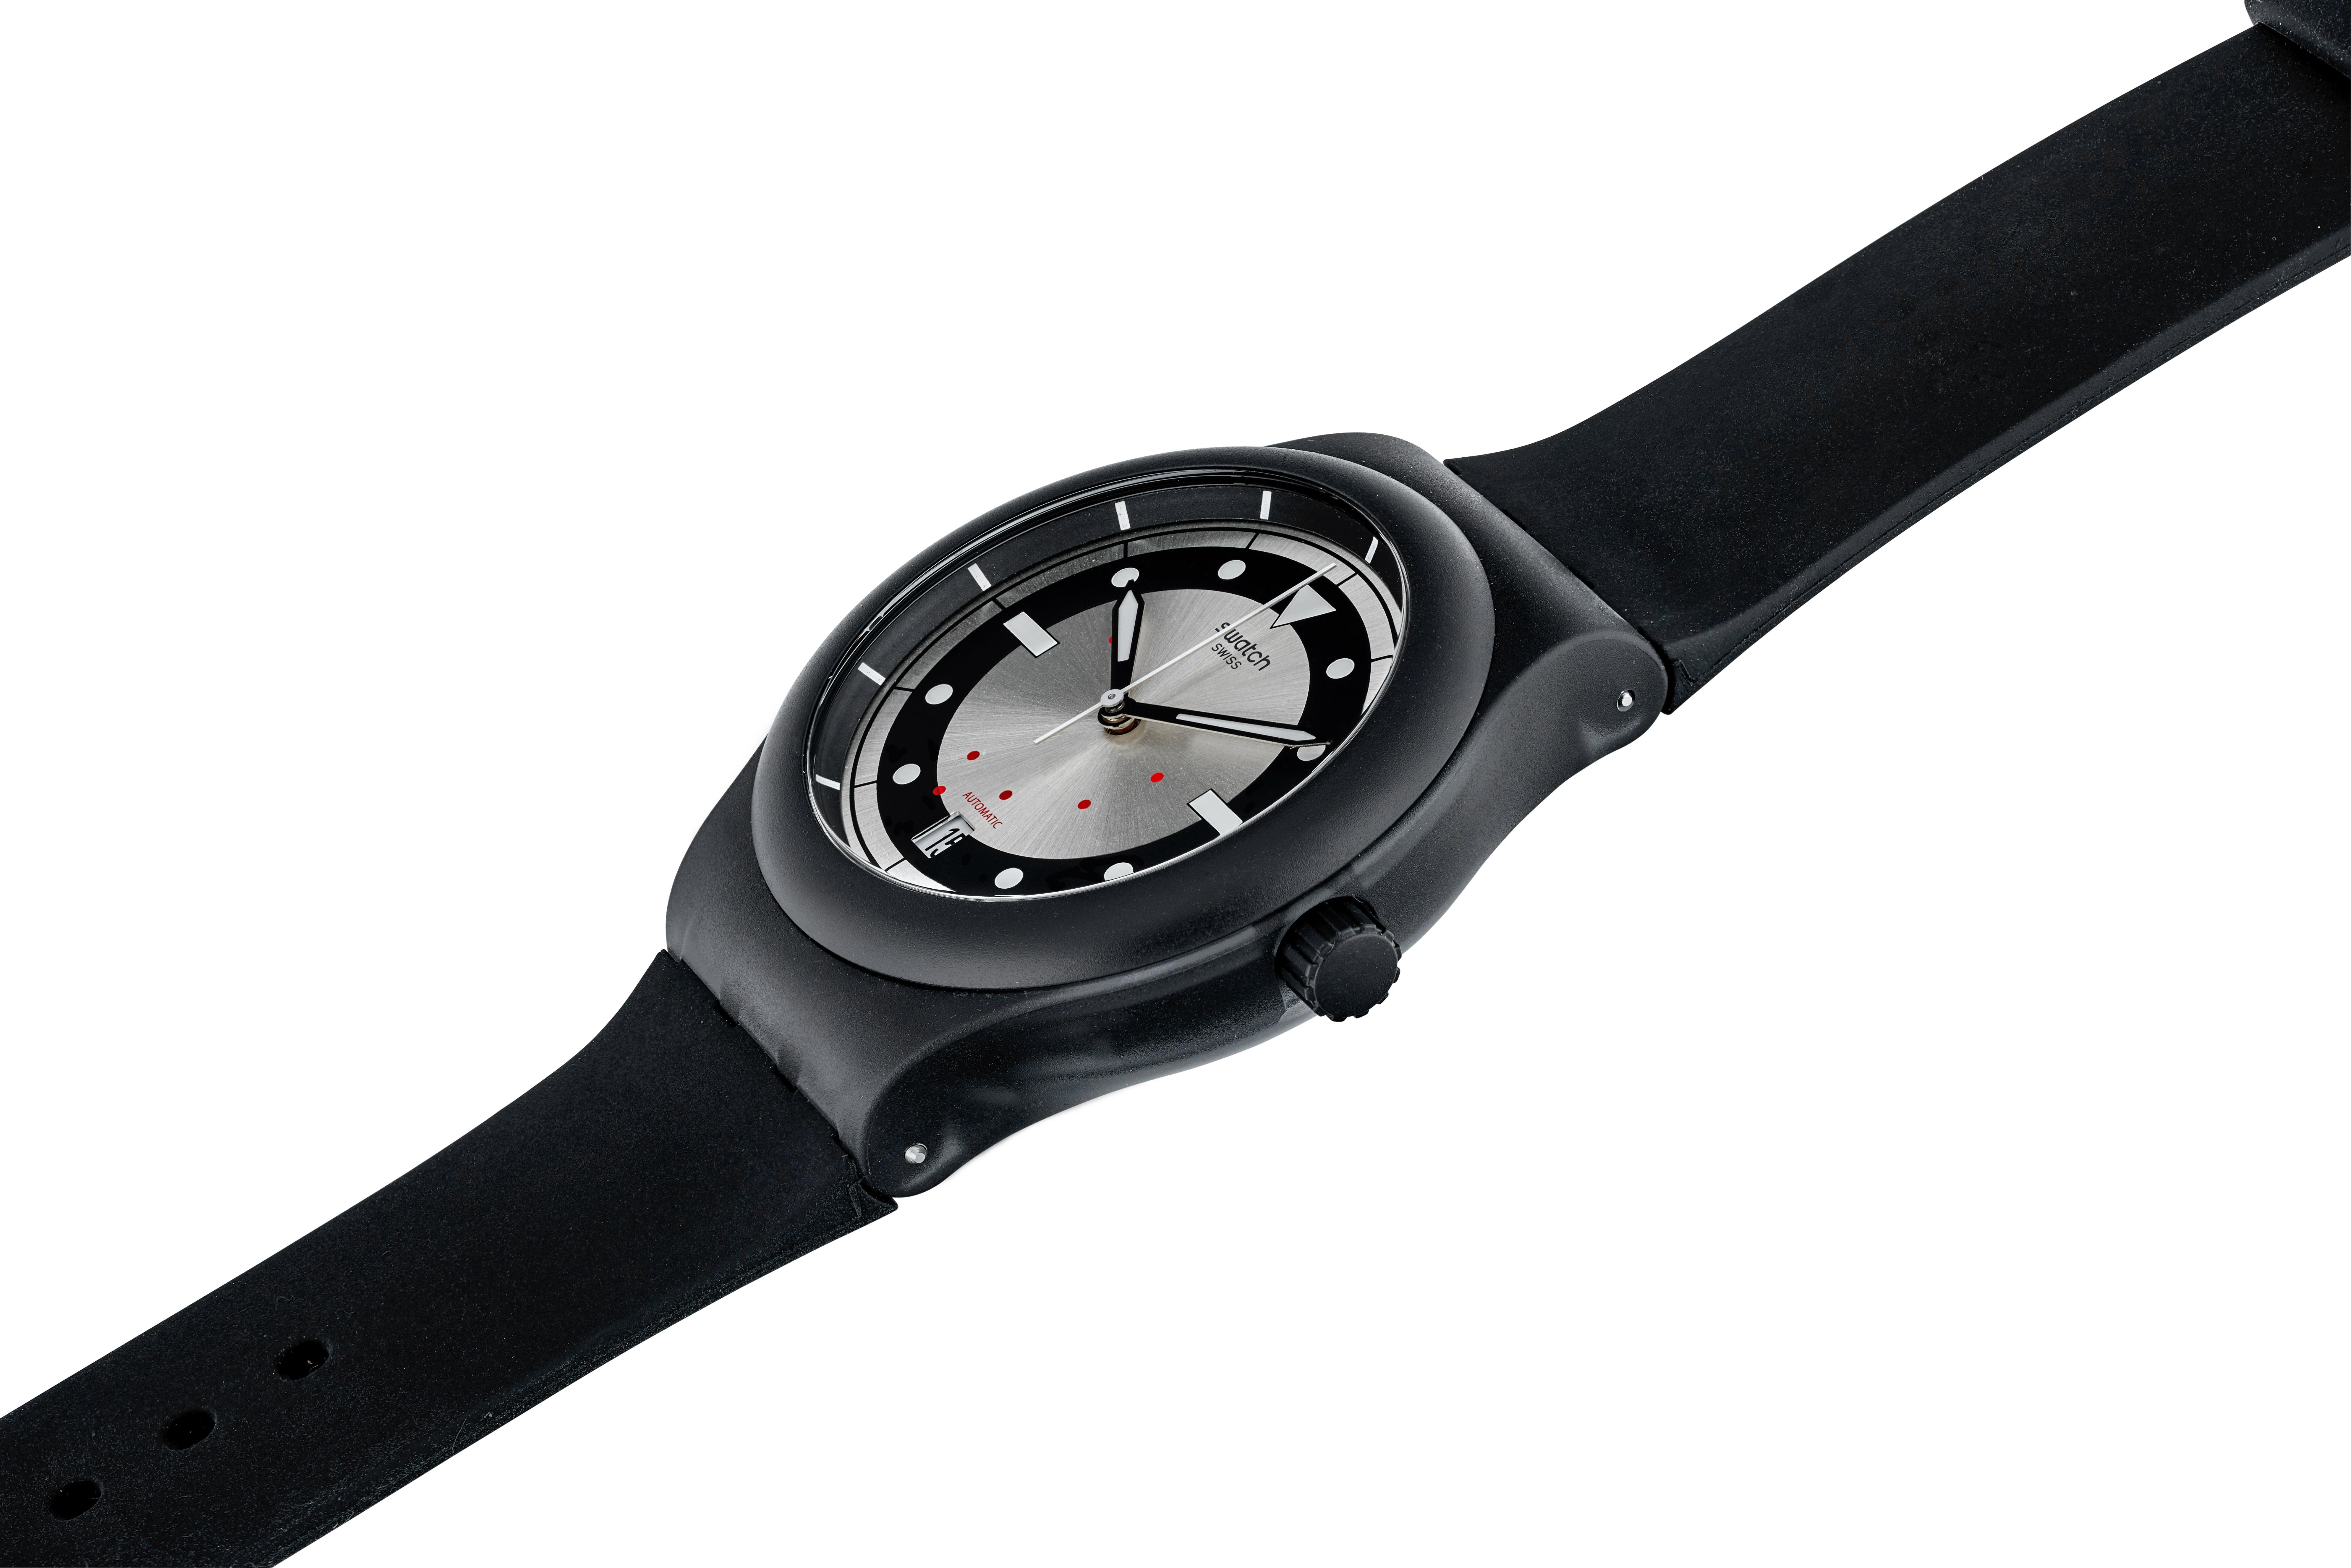 Hodinkee x Swatch